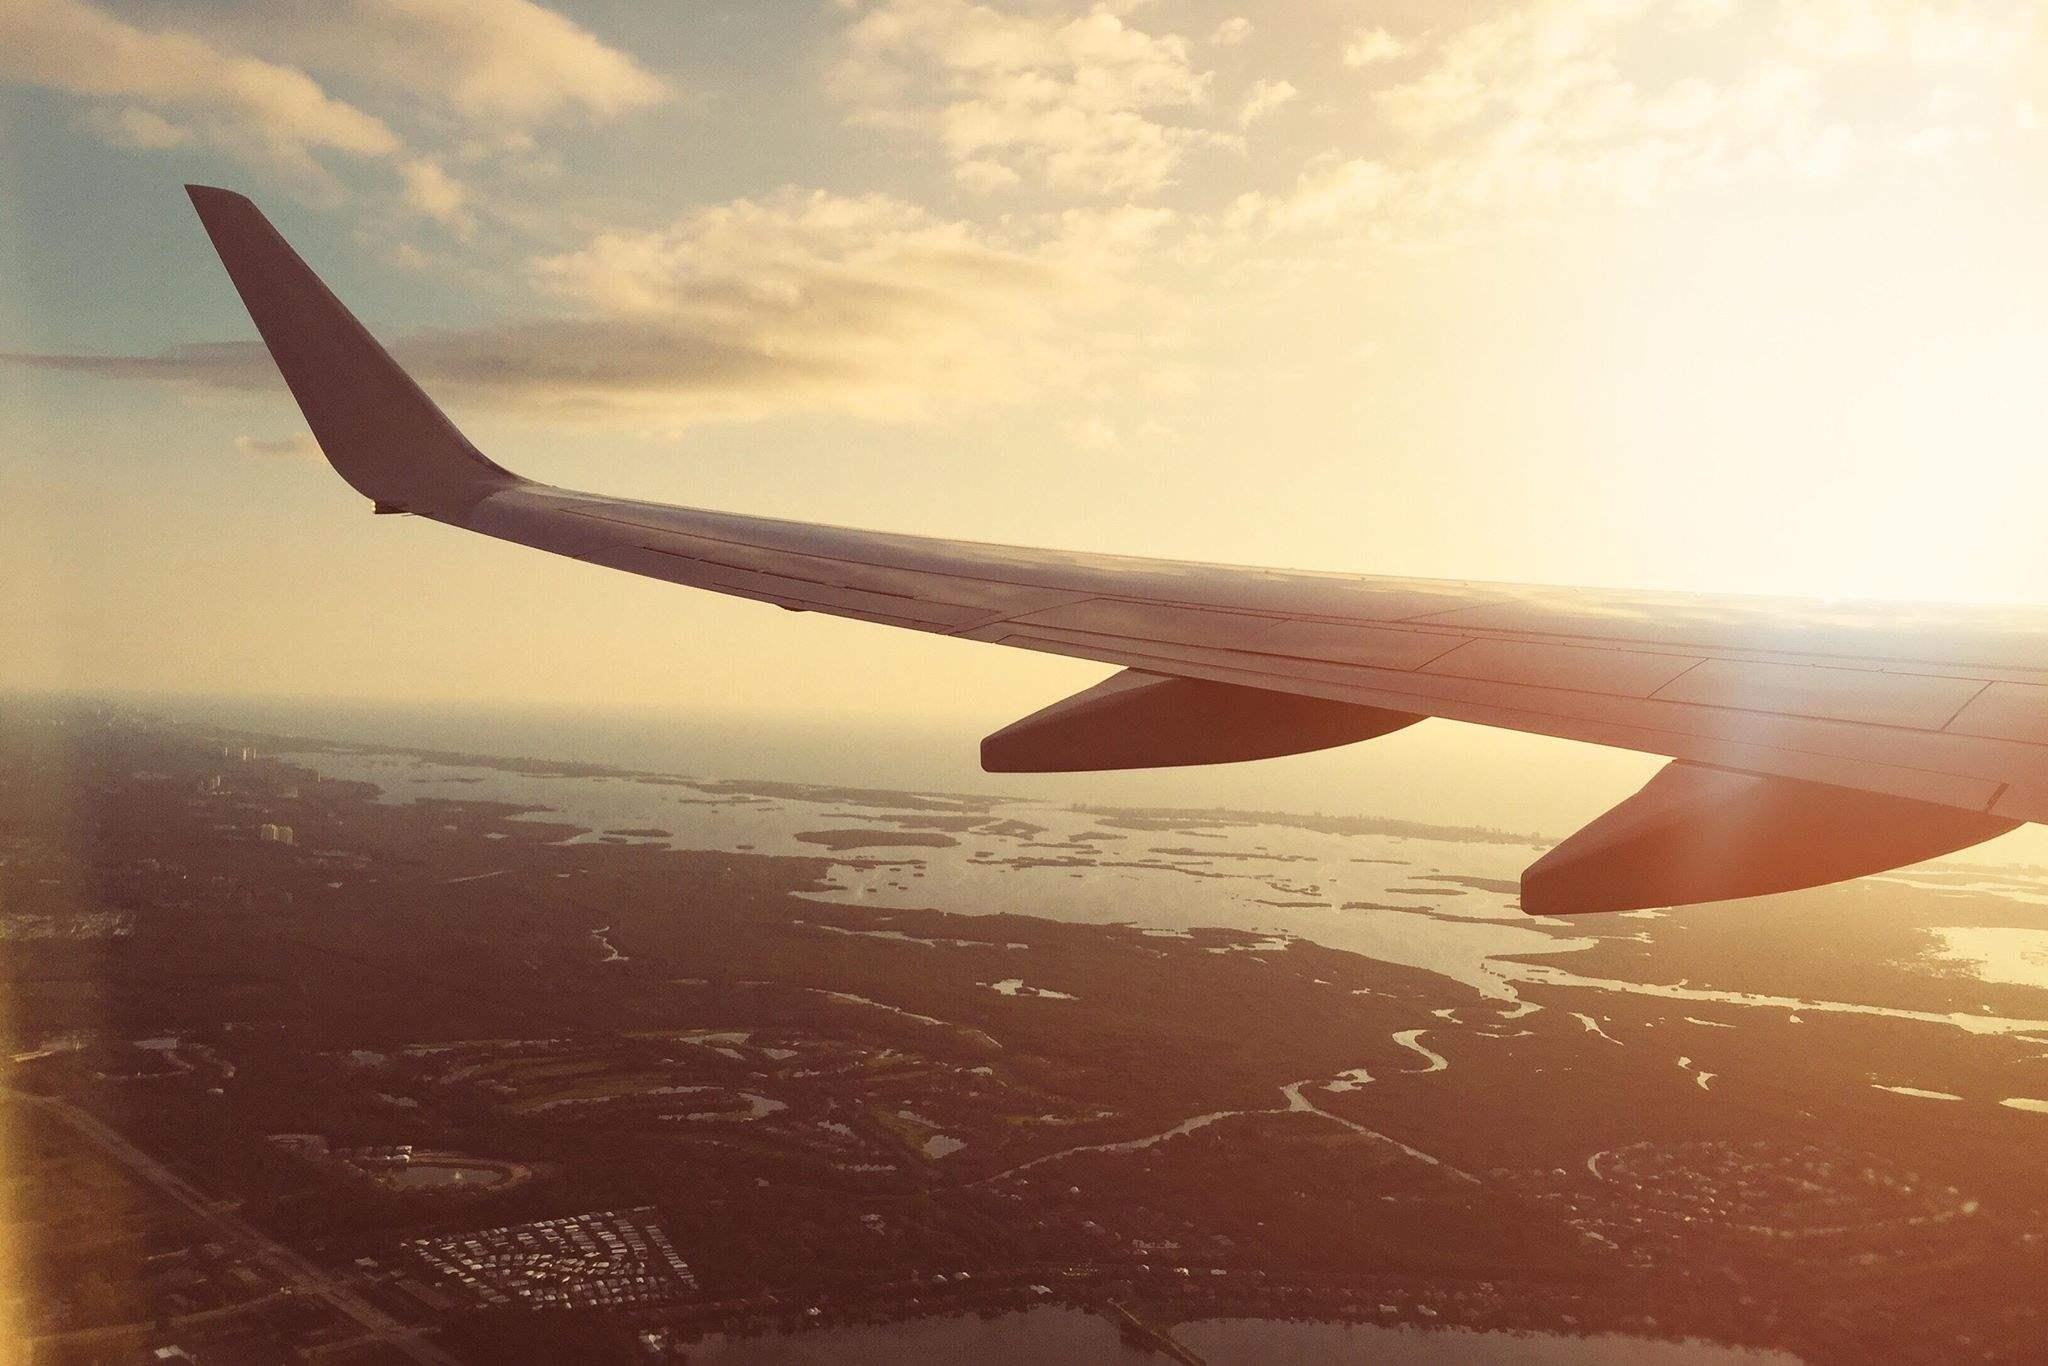 Leaving Australia - International Travel Ban and Exemptions